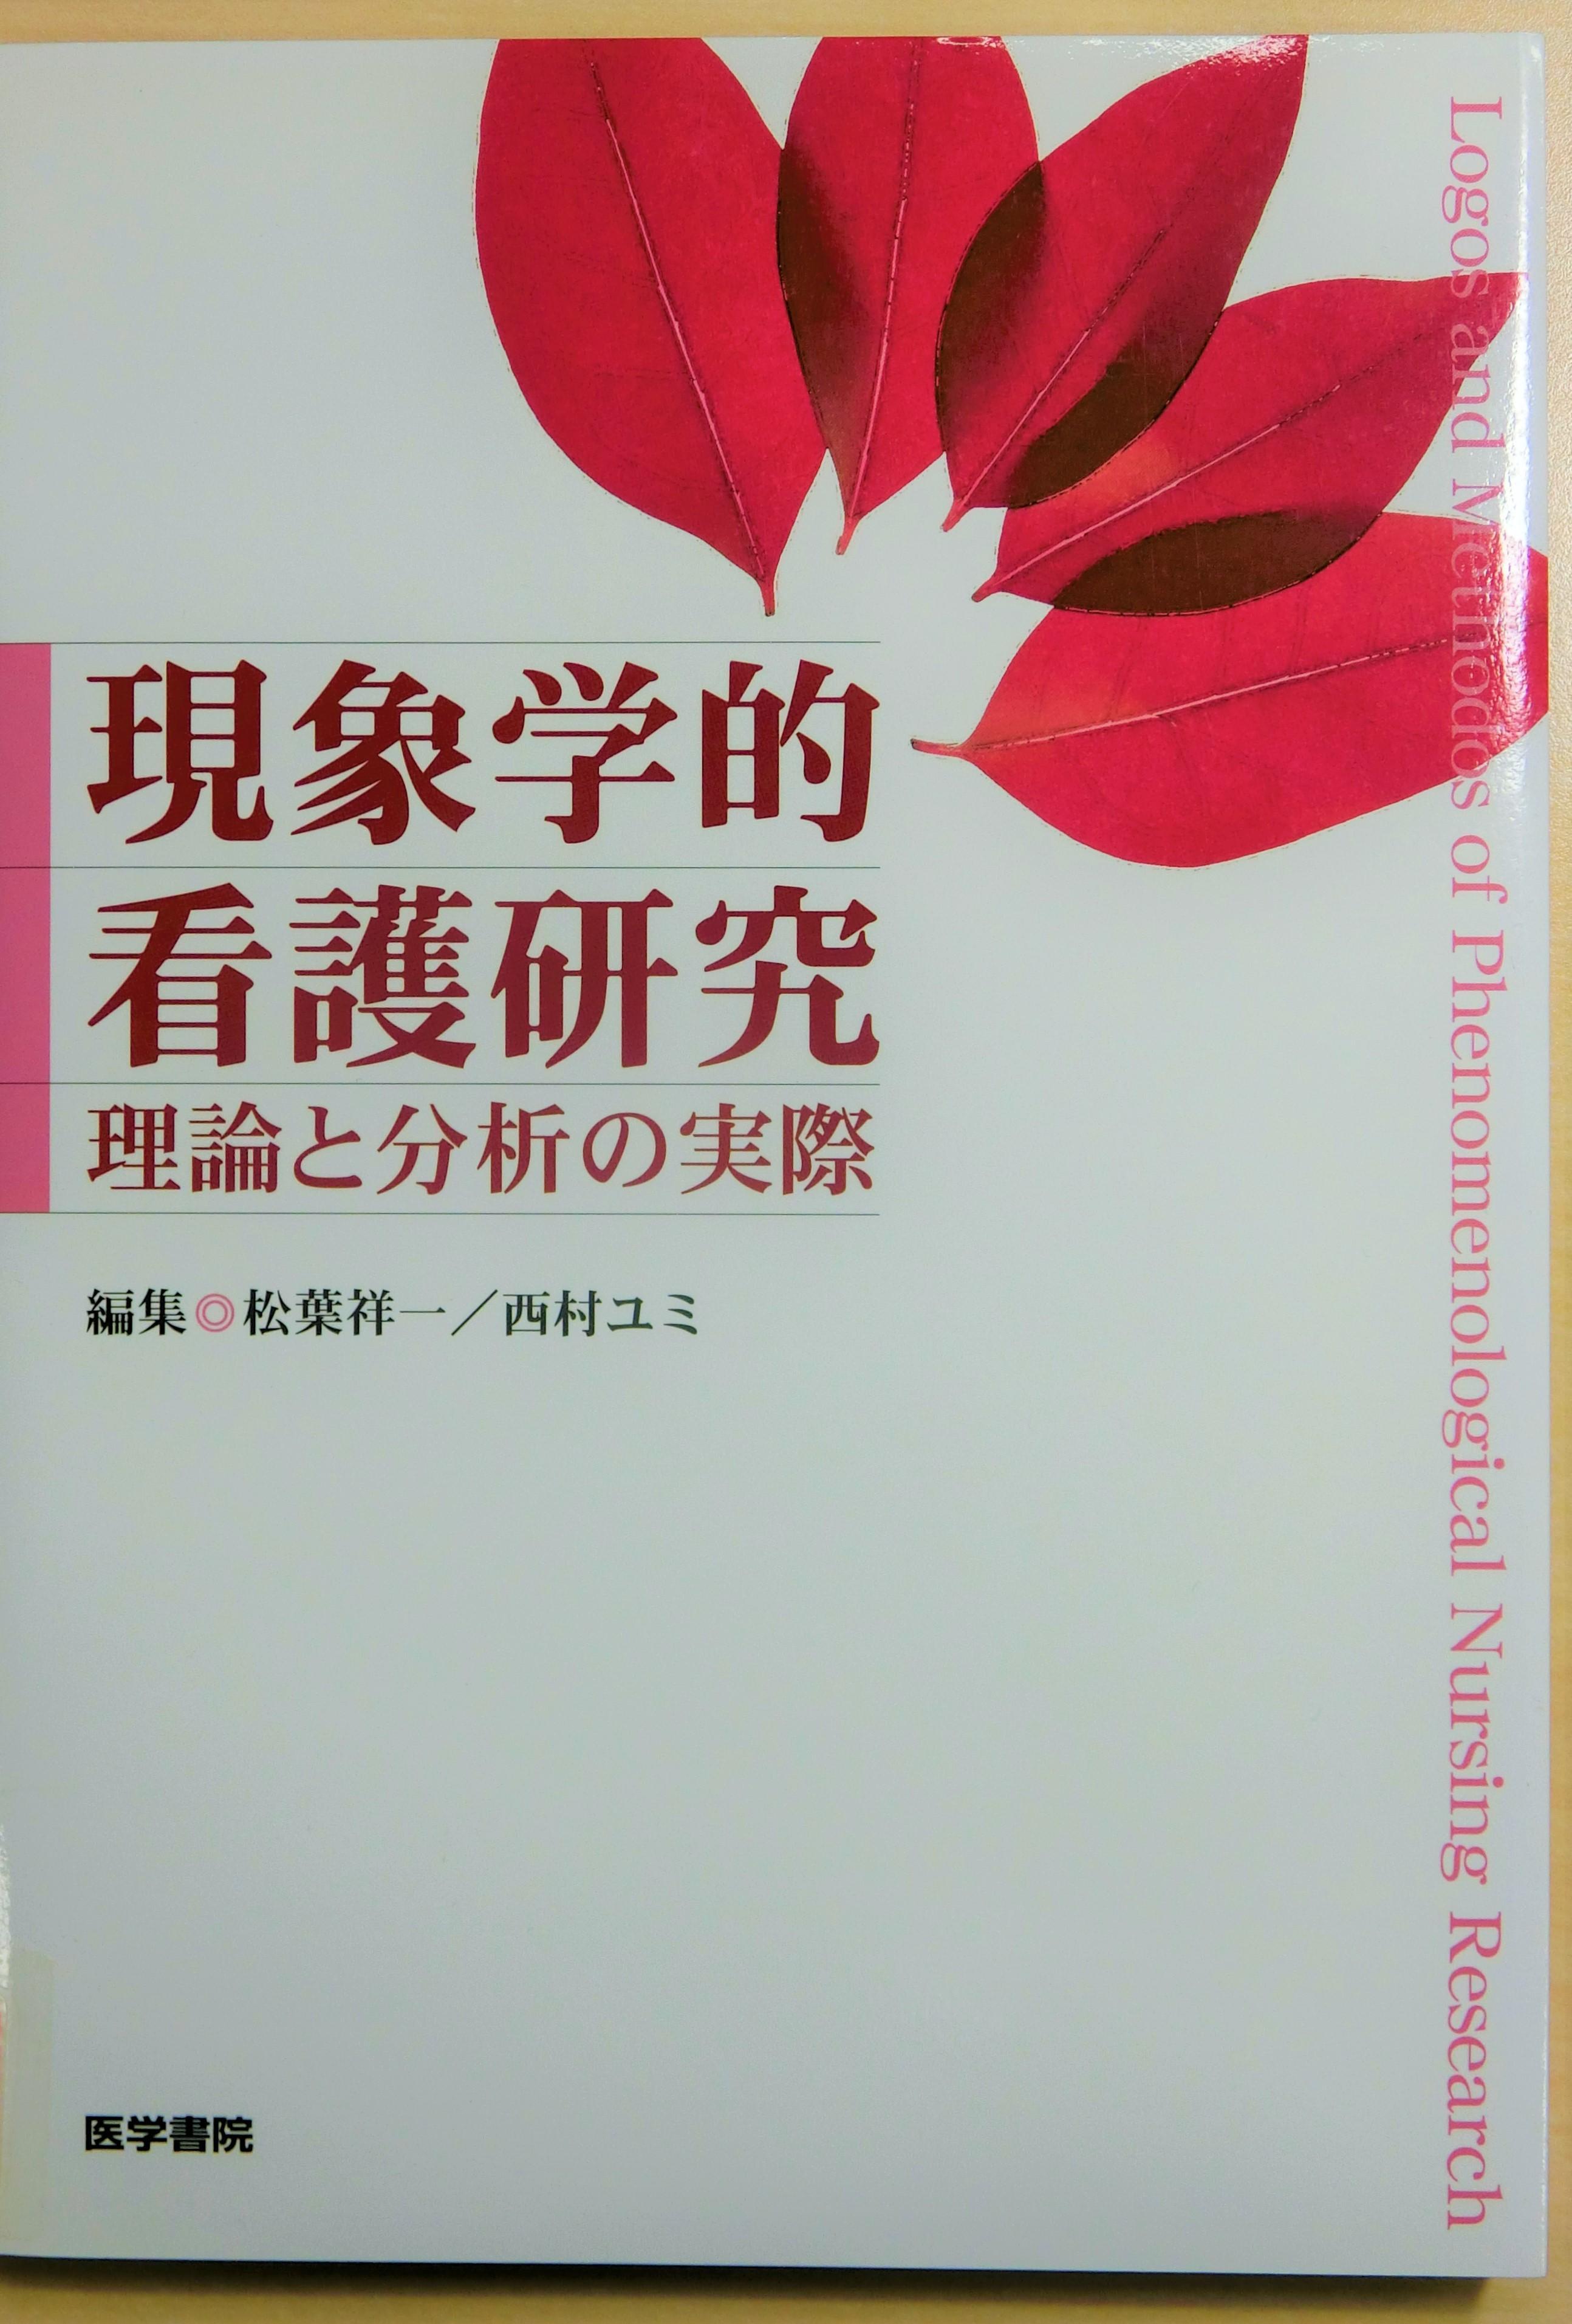 http://igs-kankan.com/article/020d91826e5a7c7223b4f3382e18713a31a51535.jpg